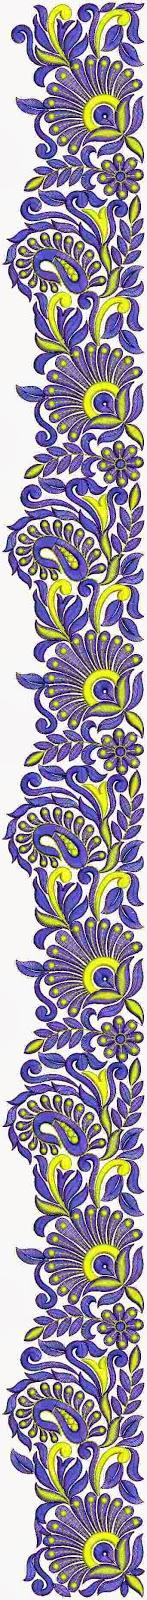 Beludji borduurwerk C Pallu sari